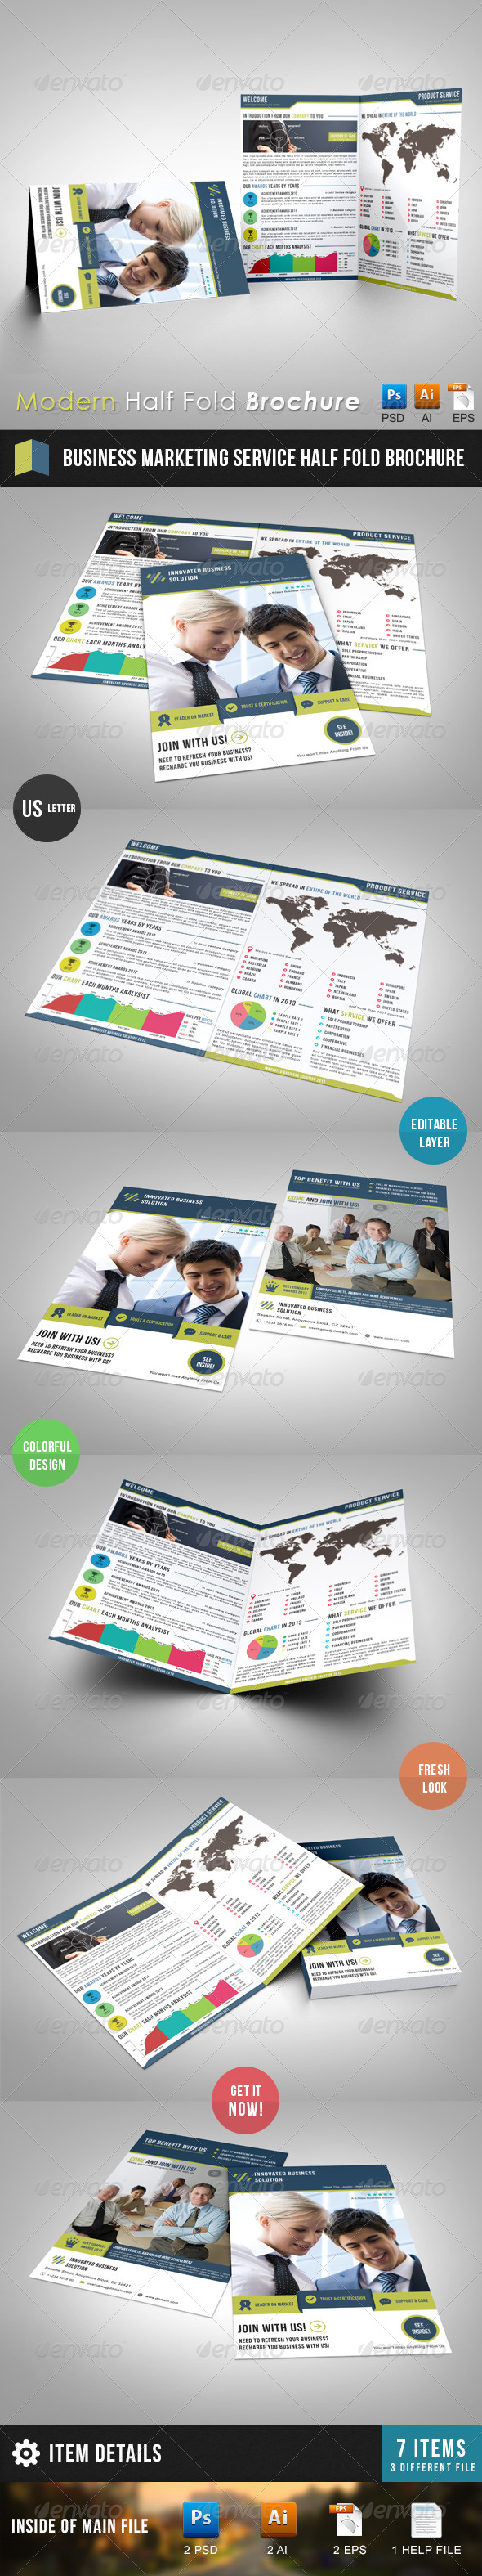 GraphicRiver Business Marketing Service Half Fold Brochure 6321764